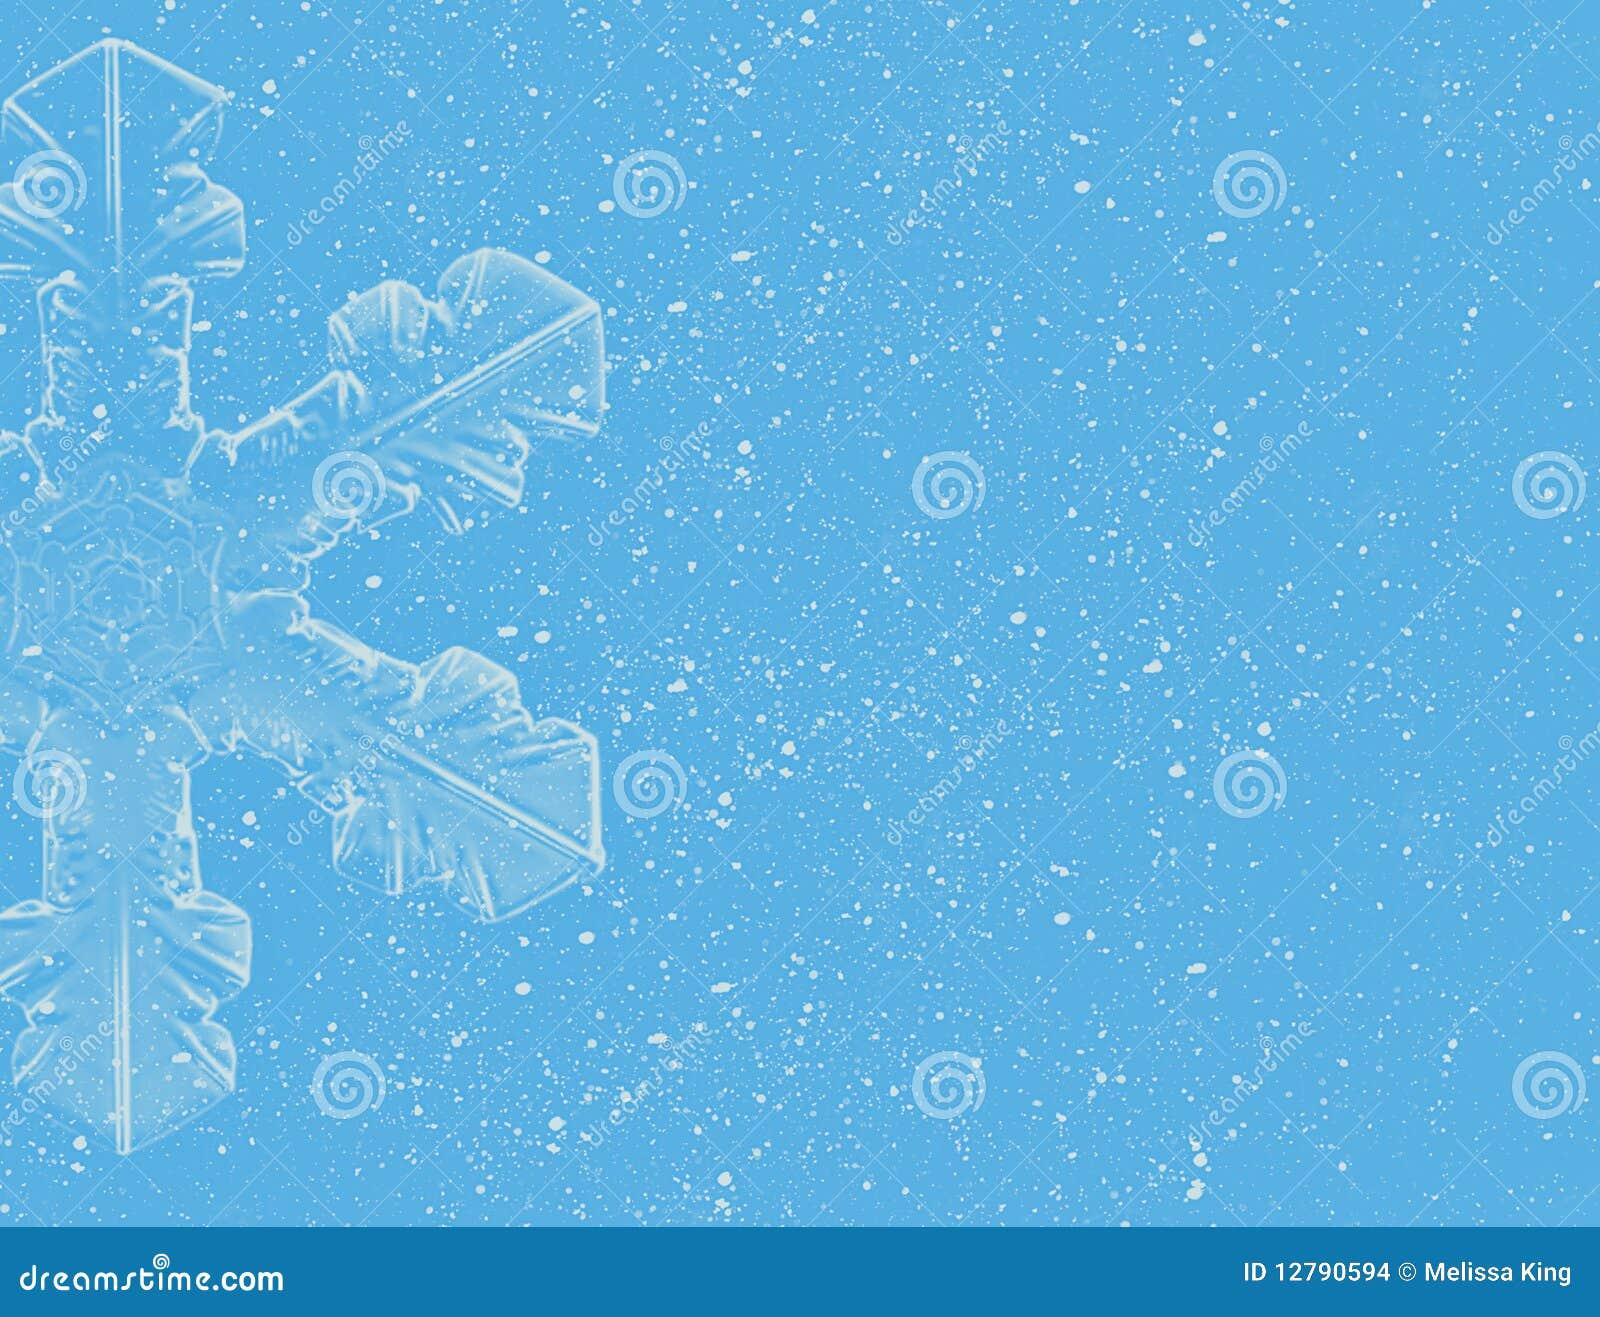 снежинка предпосылки